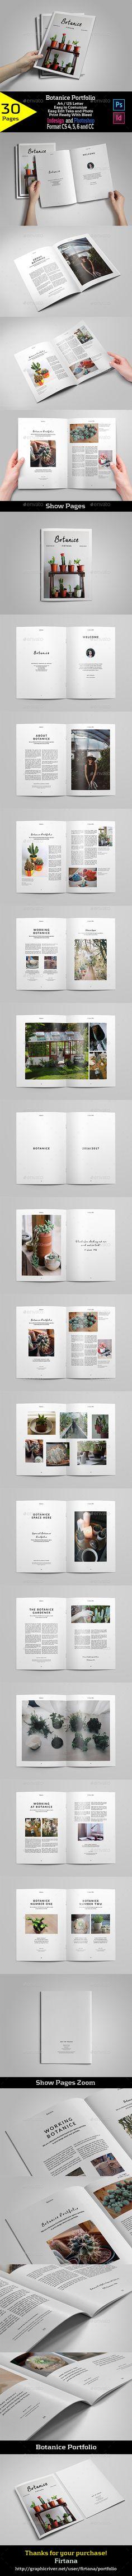 Botanice Portfolio — Photoshop PSD #design #white • Available here → https://graphicriver.net/item/botanice-portfolio/17776594?ref=pxcr